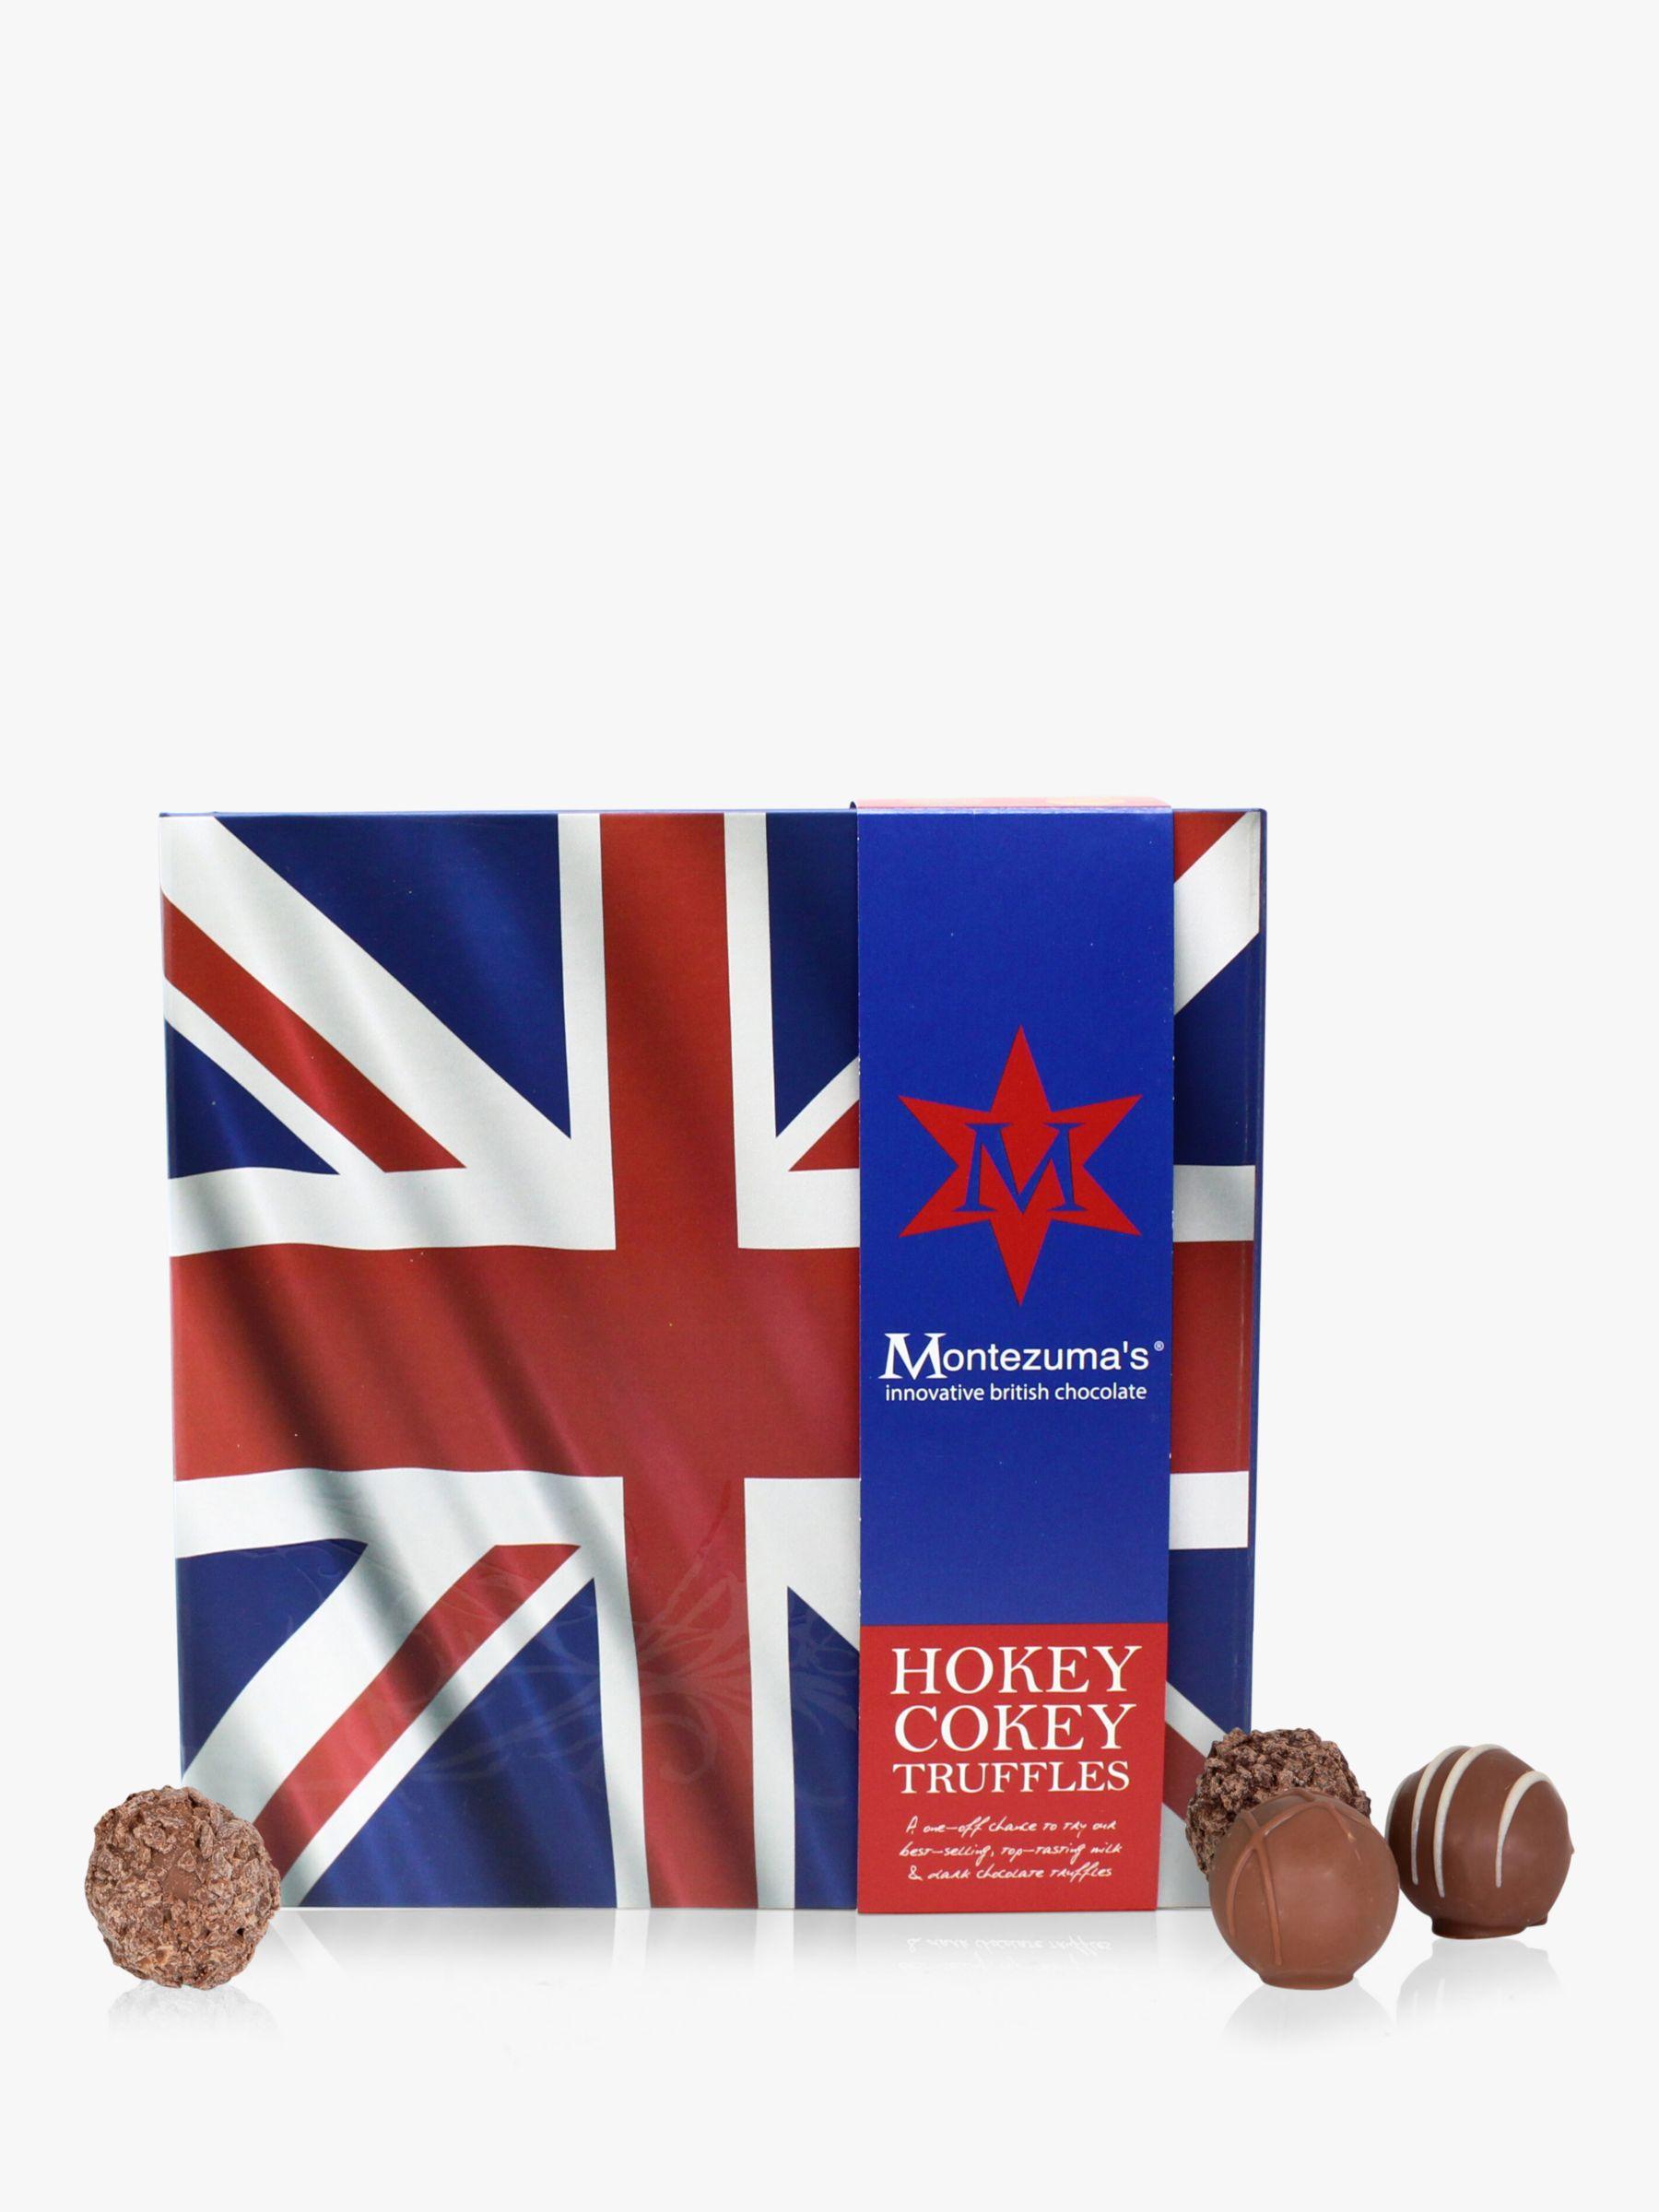 Montezuma's Montezuma's Hokey Cokey Truffles, 375g